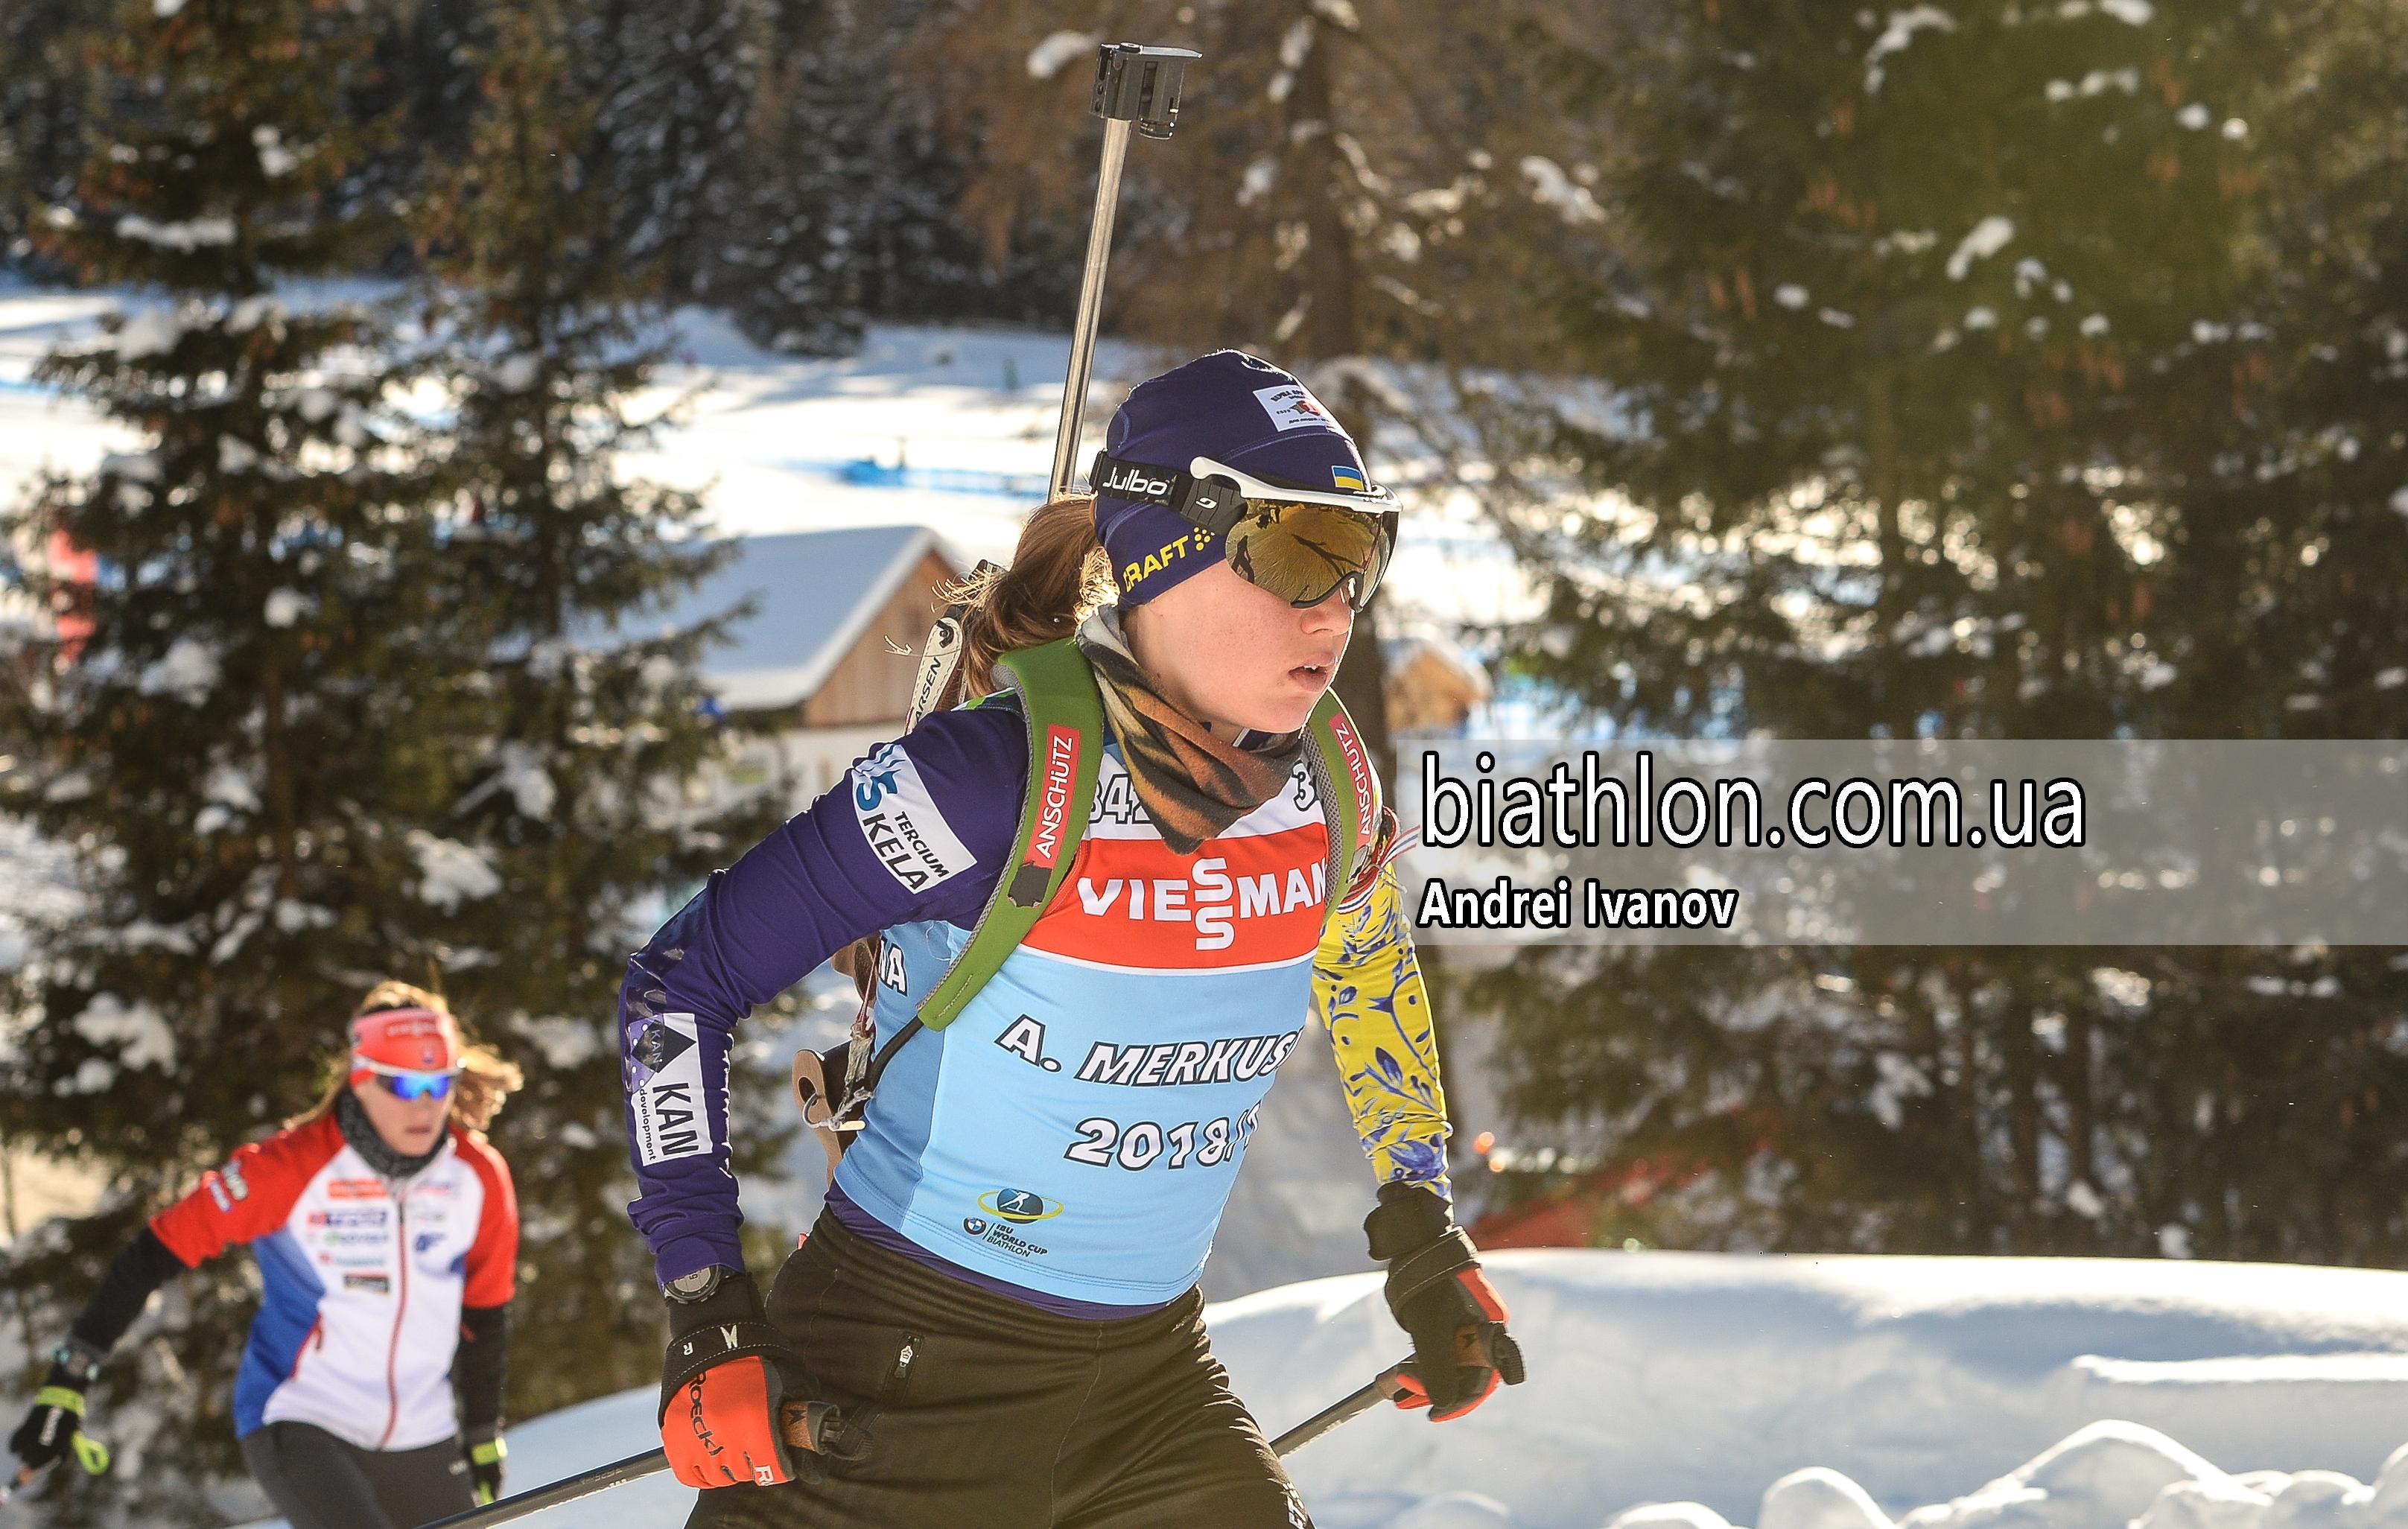 https://www.biathlon.com.ua/uploads/2019/90135.jpg